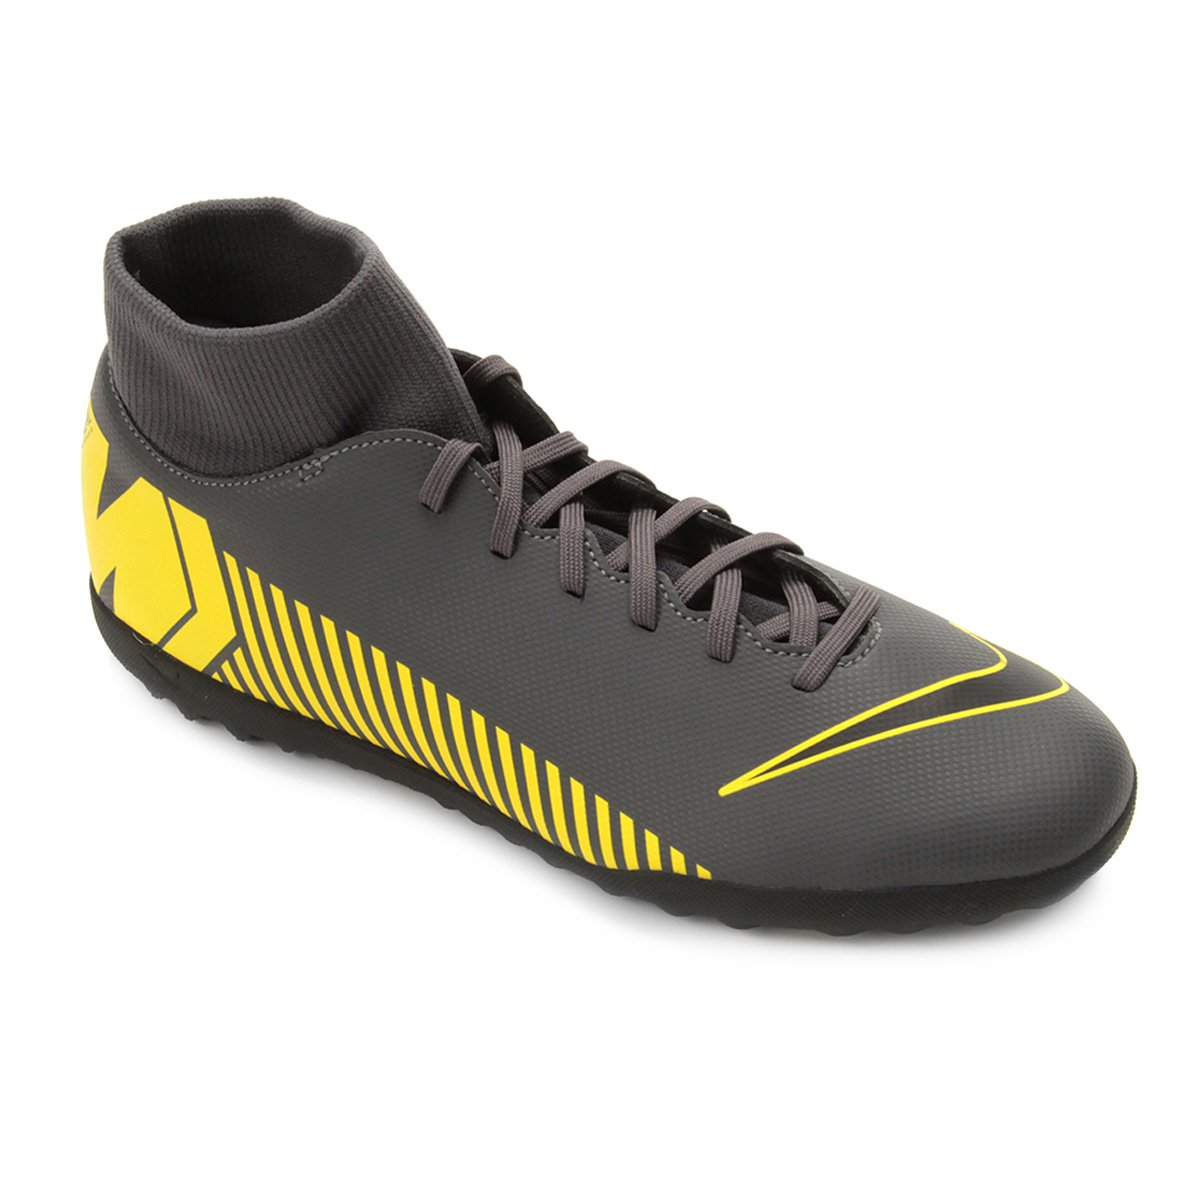 bcca3b5a57 Chuteira Society Nike Superfly 6 Club TF - Cinza e Amarelo - Compre ...